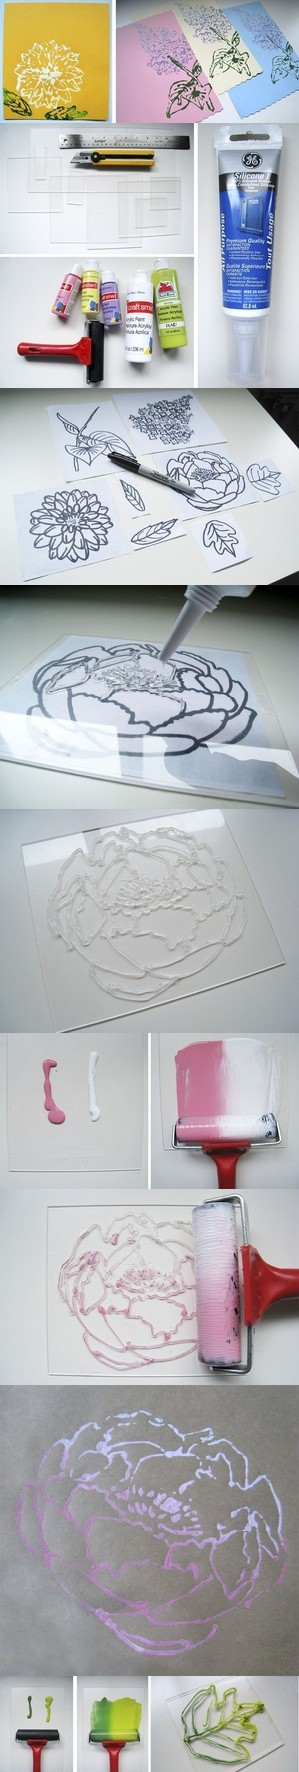 hot glue prints